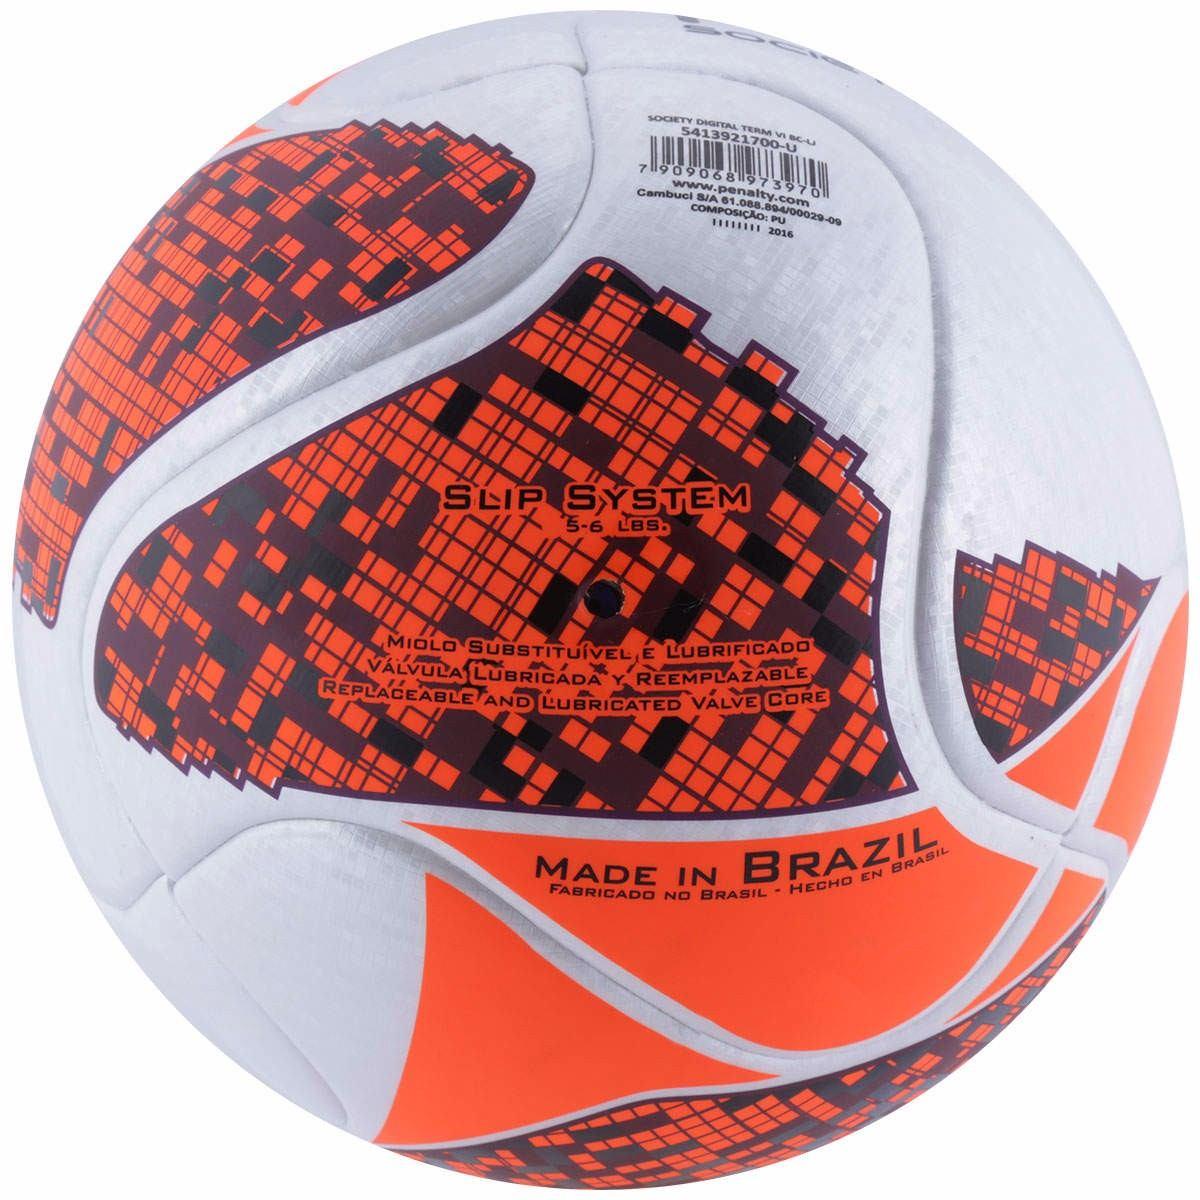 Carregando zoom... bola para futebol society penalty digital termotec 9d89905f6082a